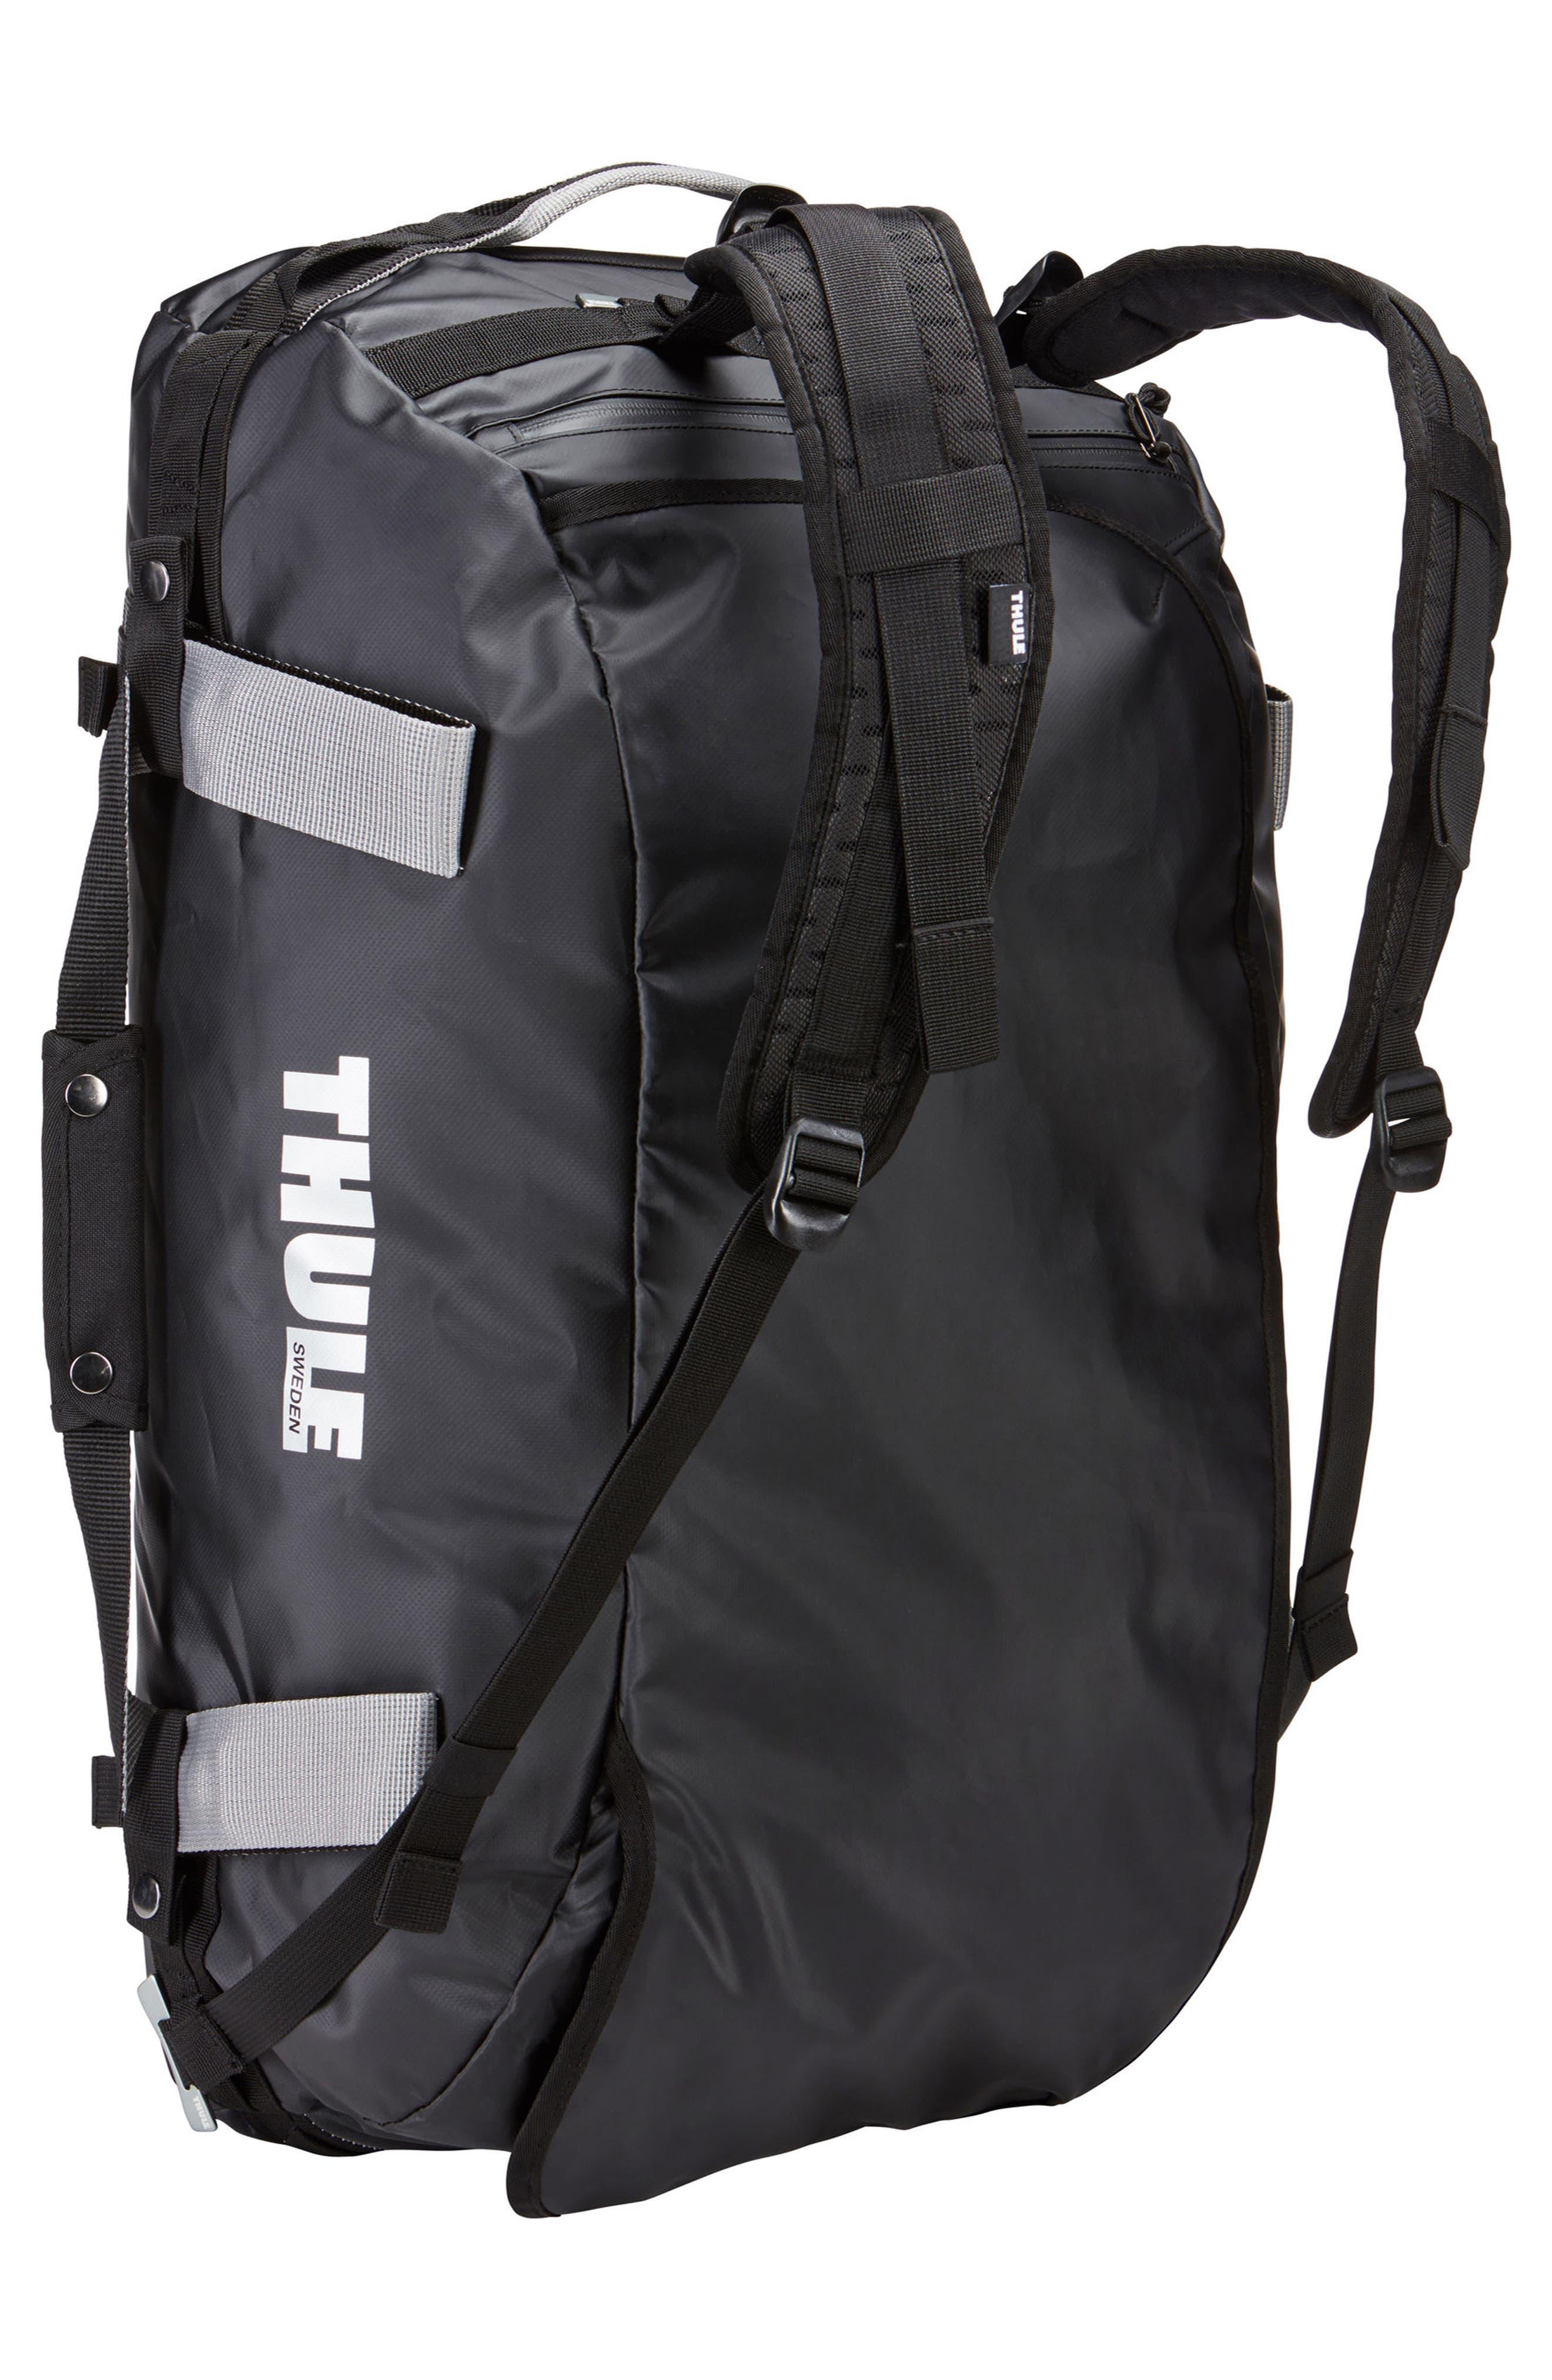 Chasm 130-Liter Convertible Duffel Bag,                             Alternate thumbnail 3, color,                             BLACK